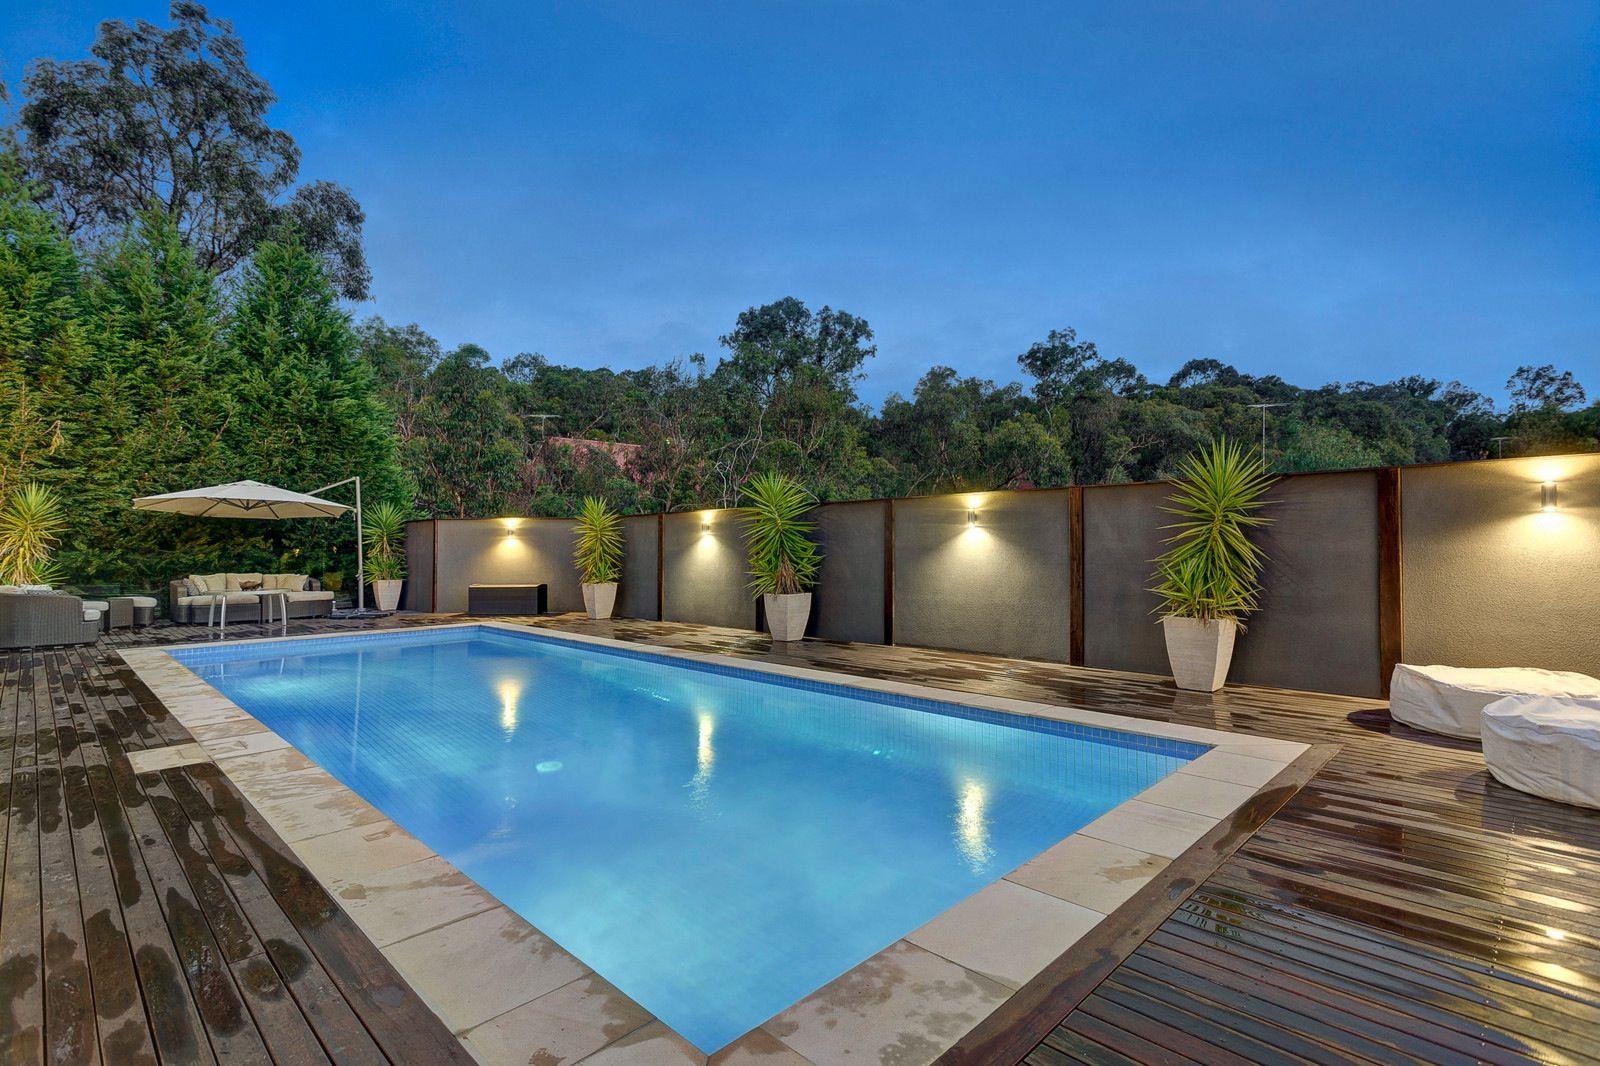 Wall lighting backdrop pools spools pinterest modern pools wall lighting backdrop aloadofball Choice Image